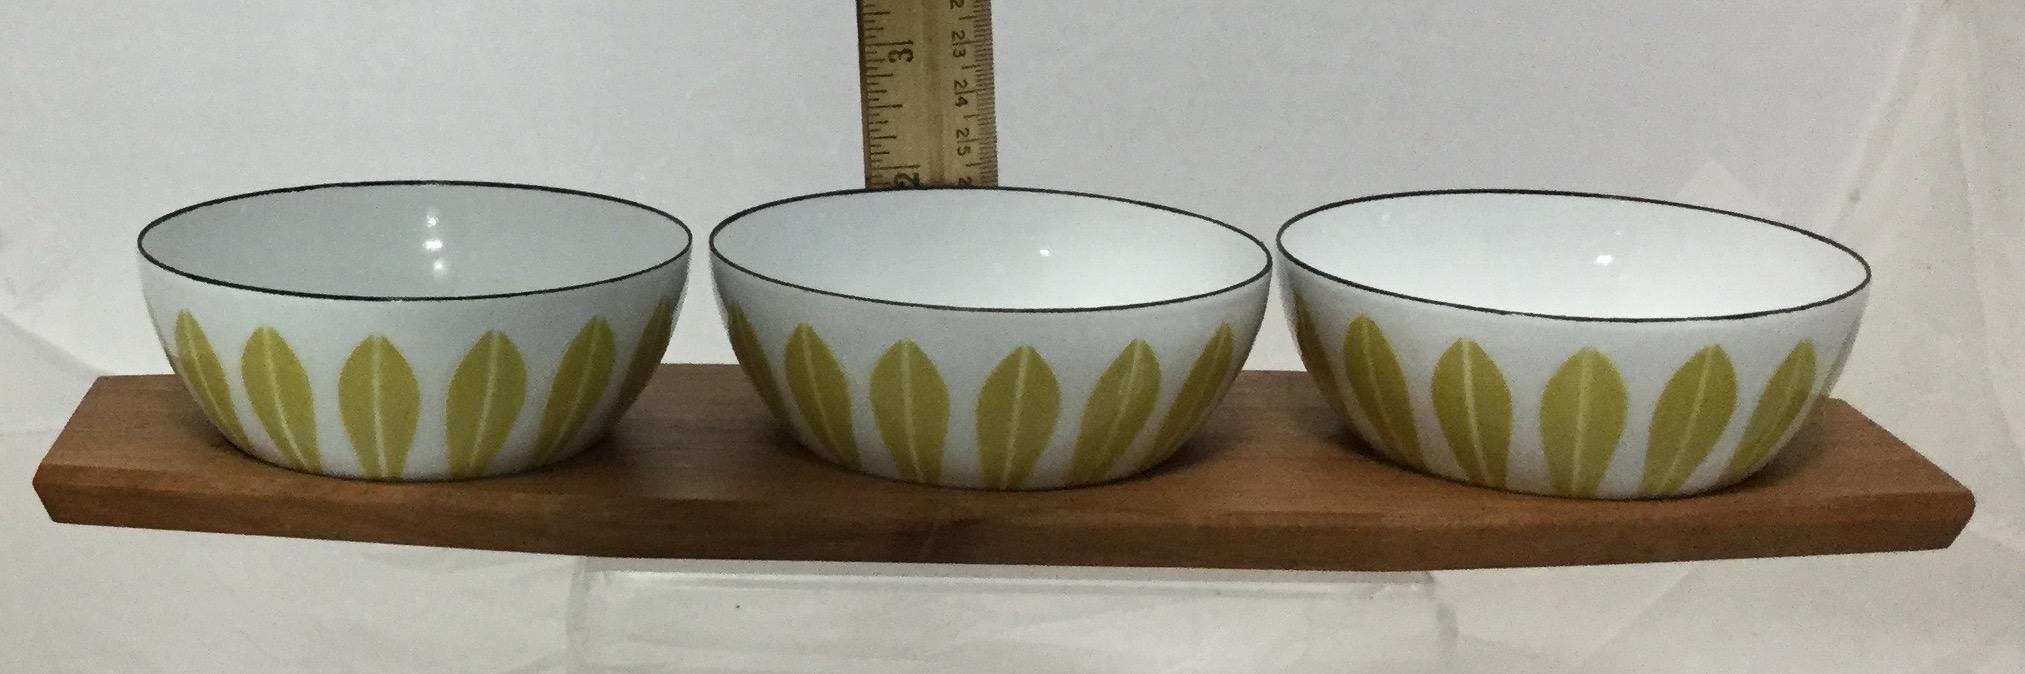 Three-Small-Enamel-Bowls-and-Tray_58255H.jpg